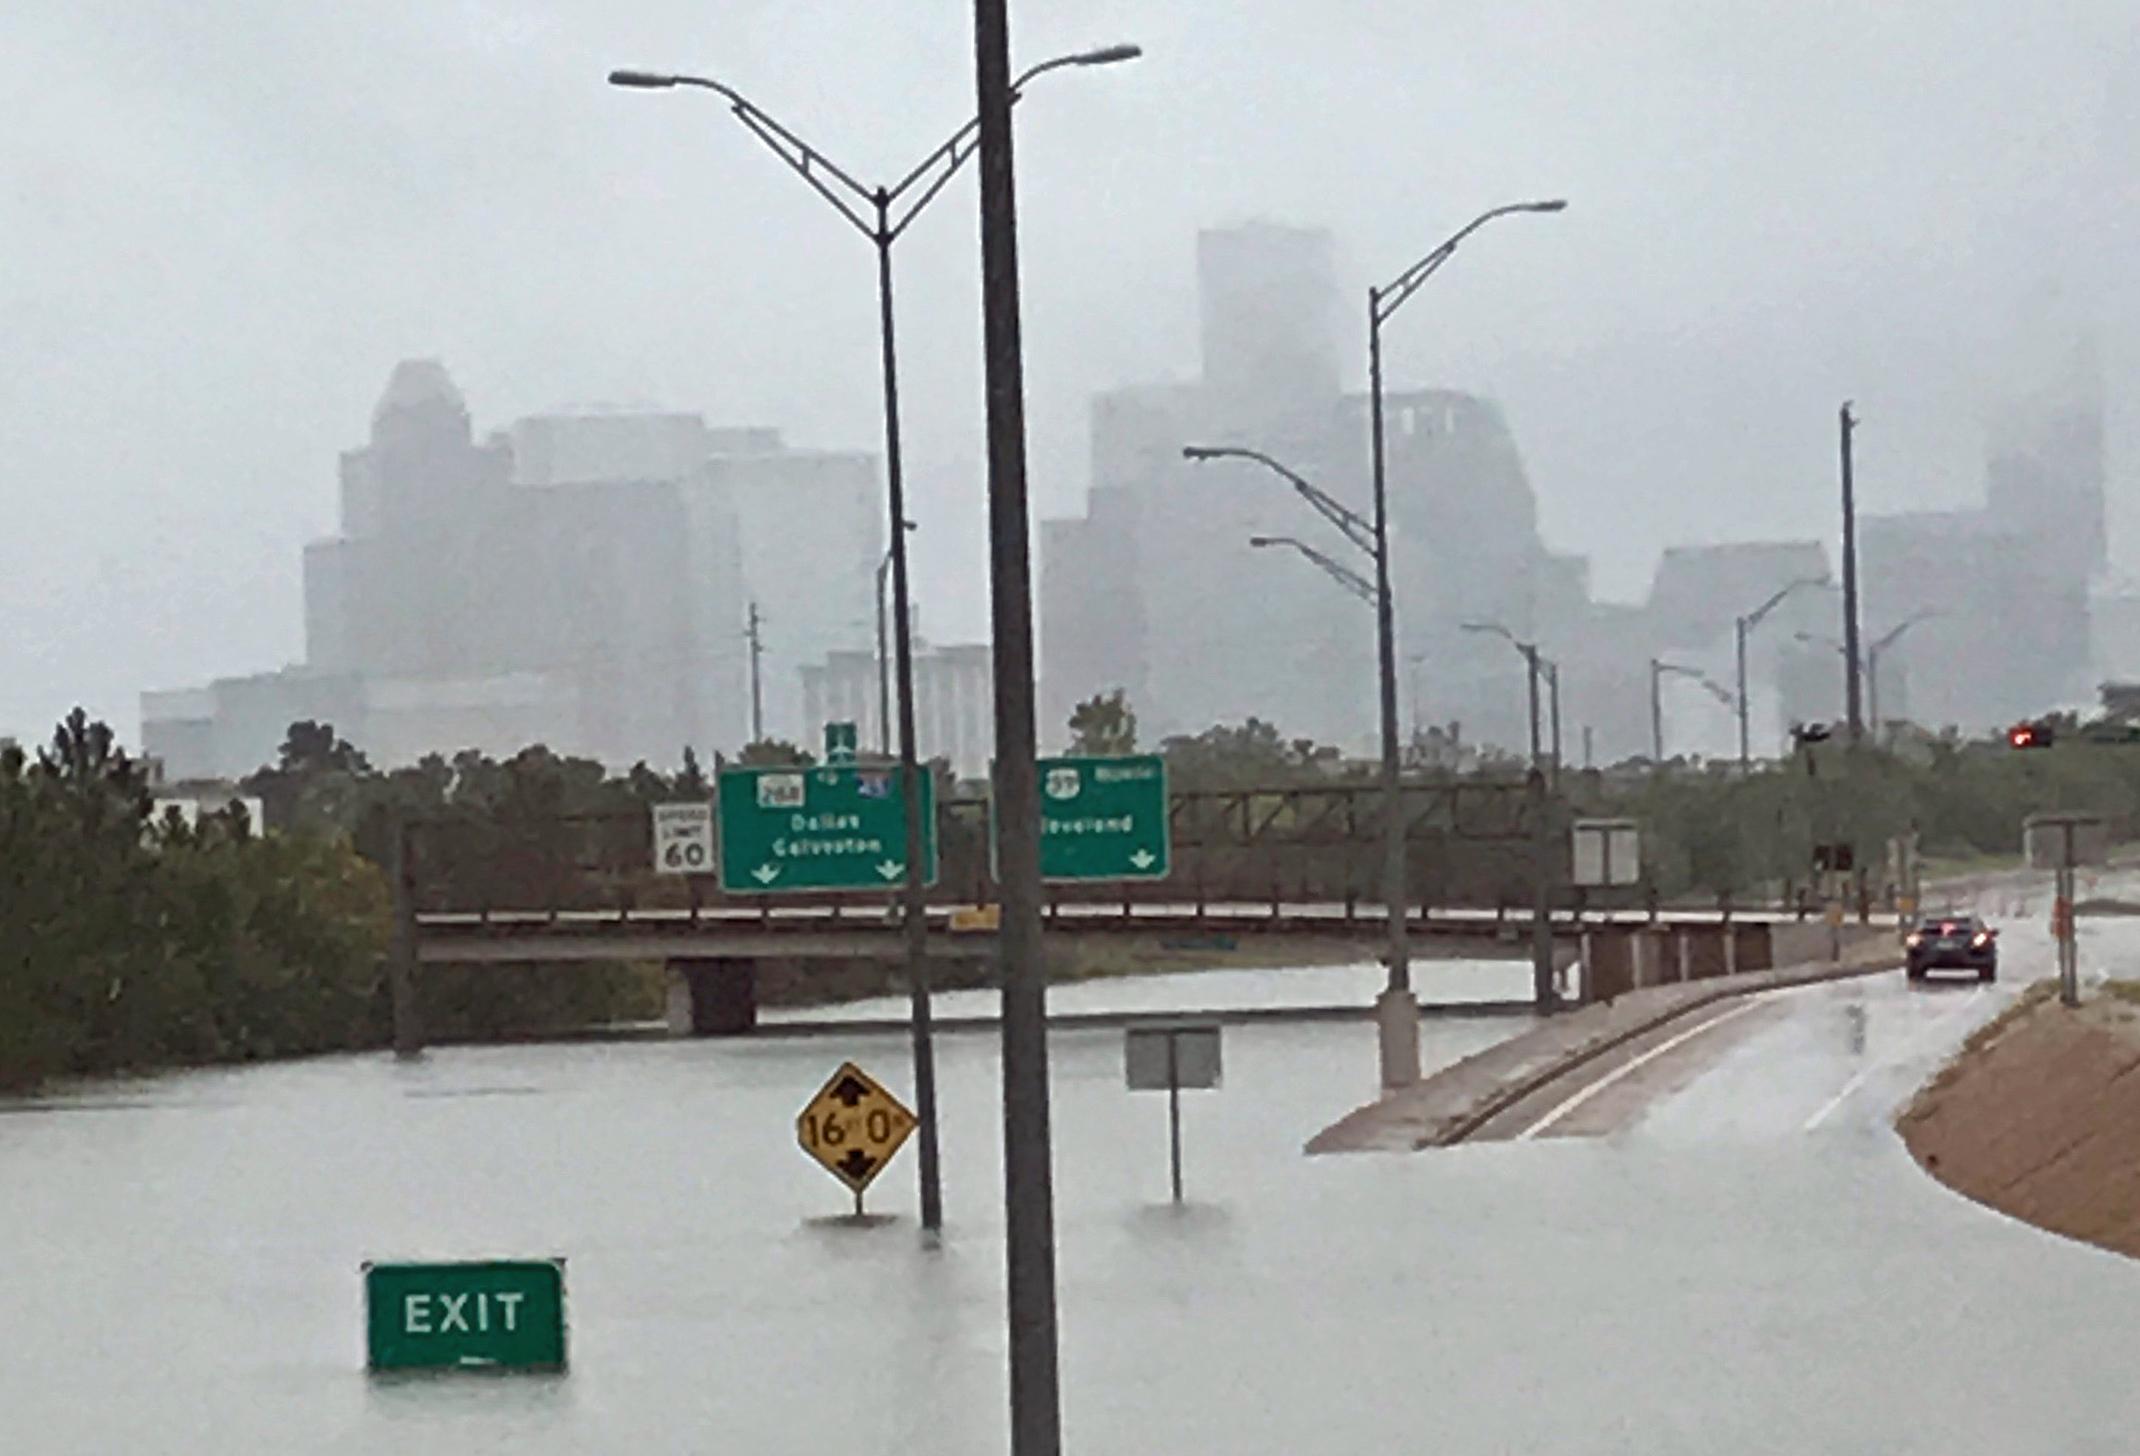 Flooded_Highway_Exits.jpg